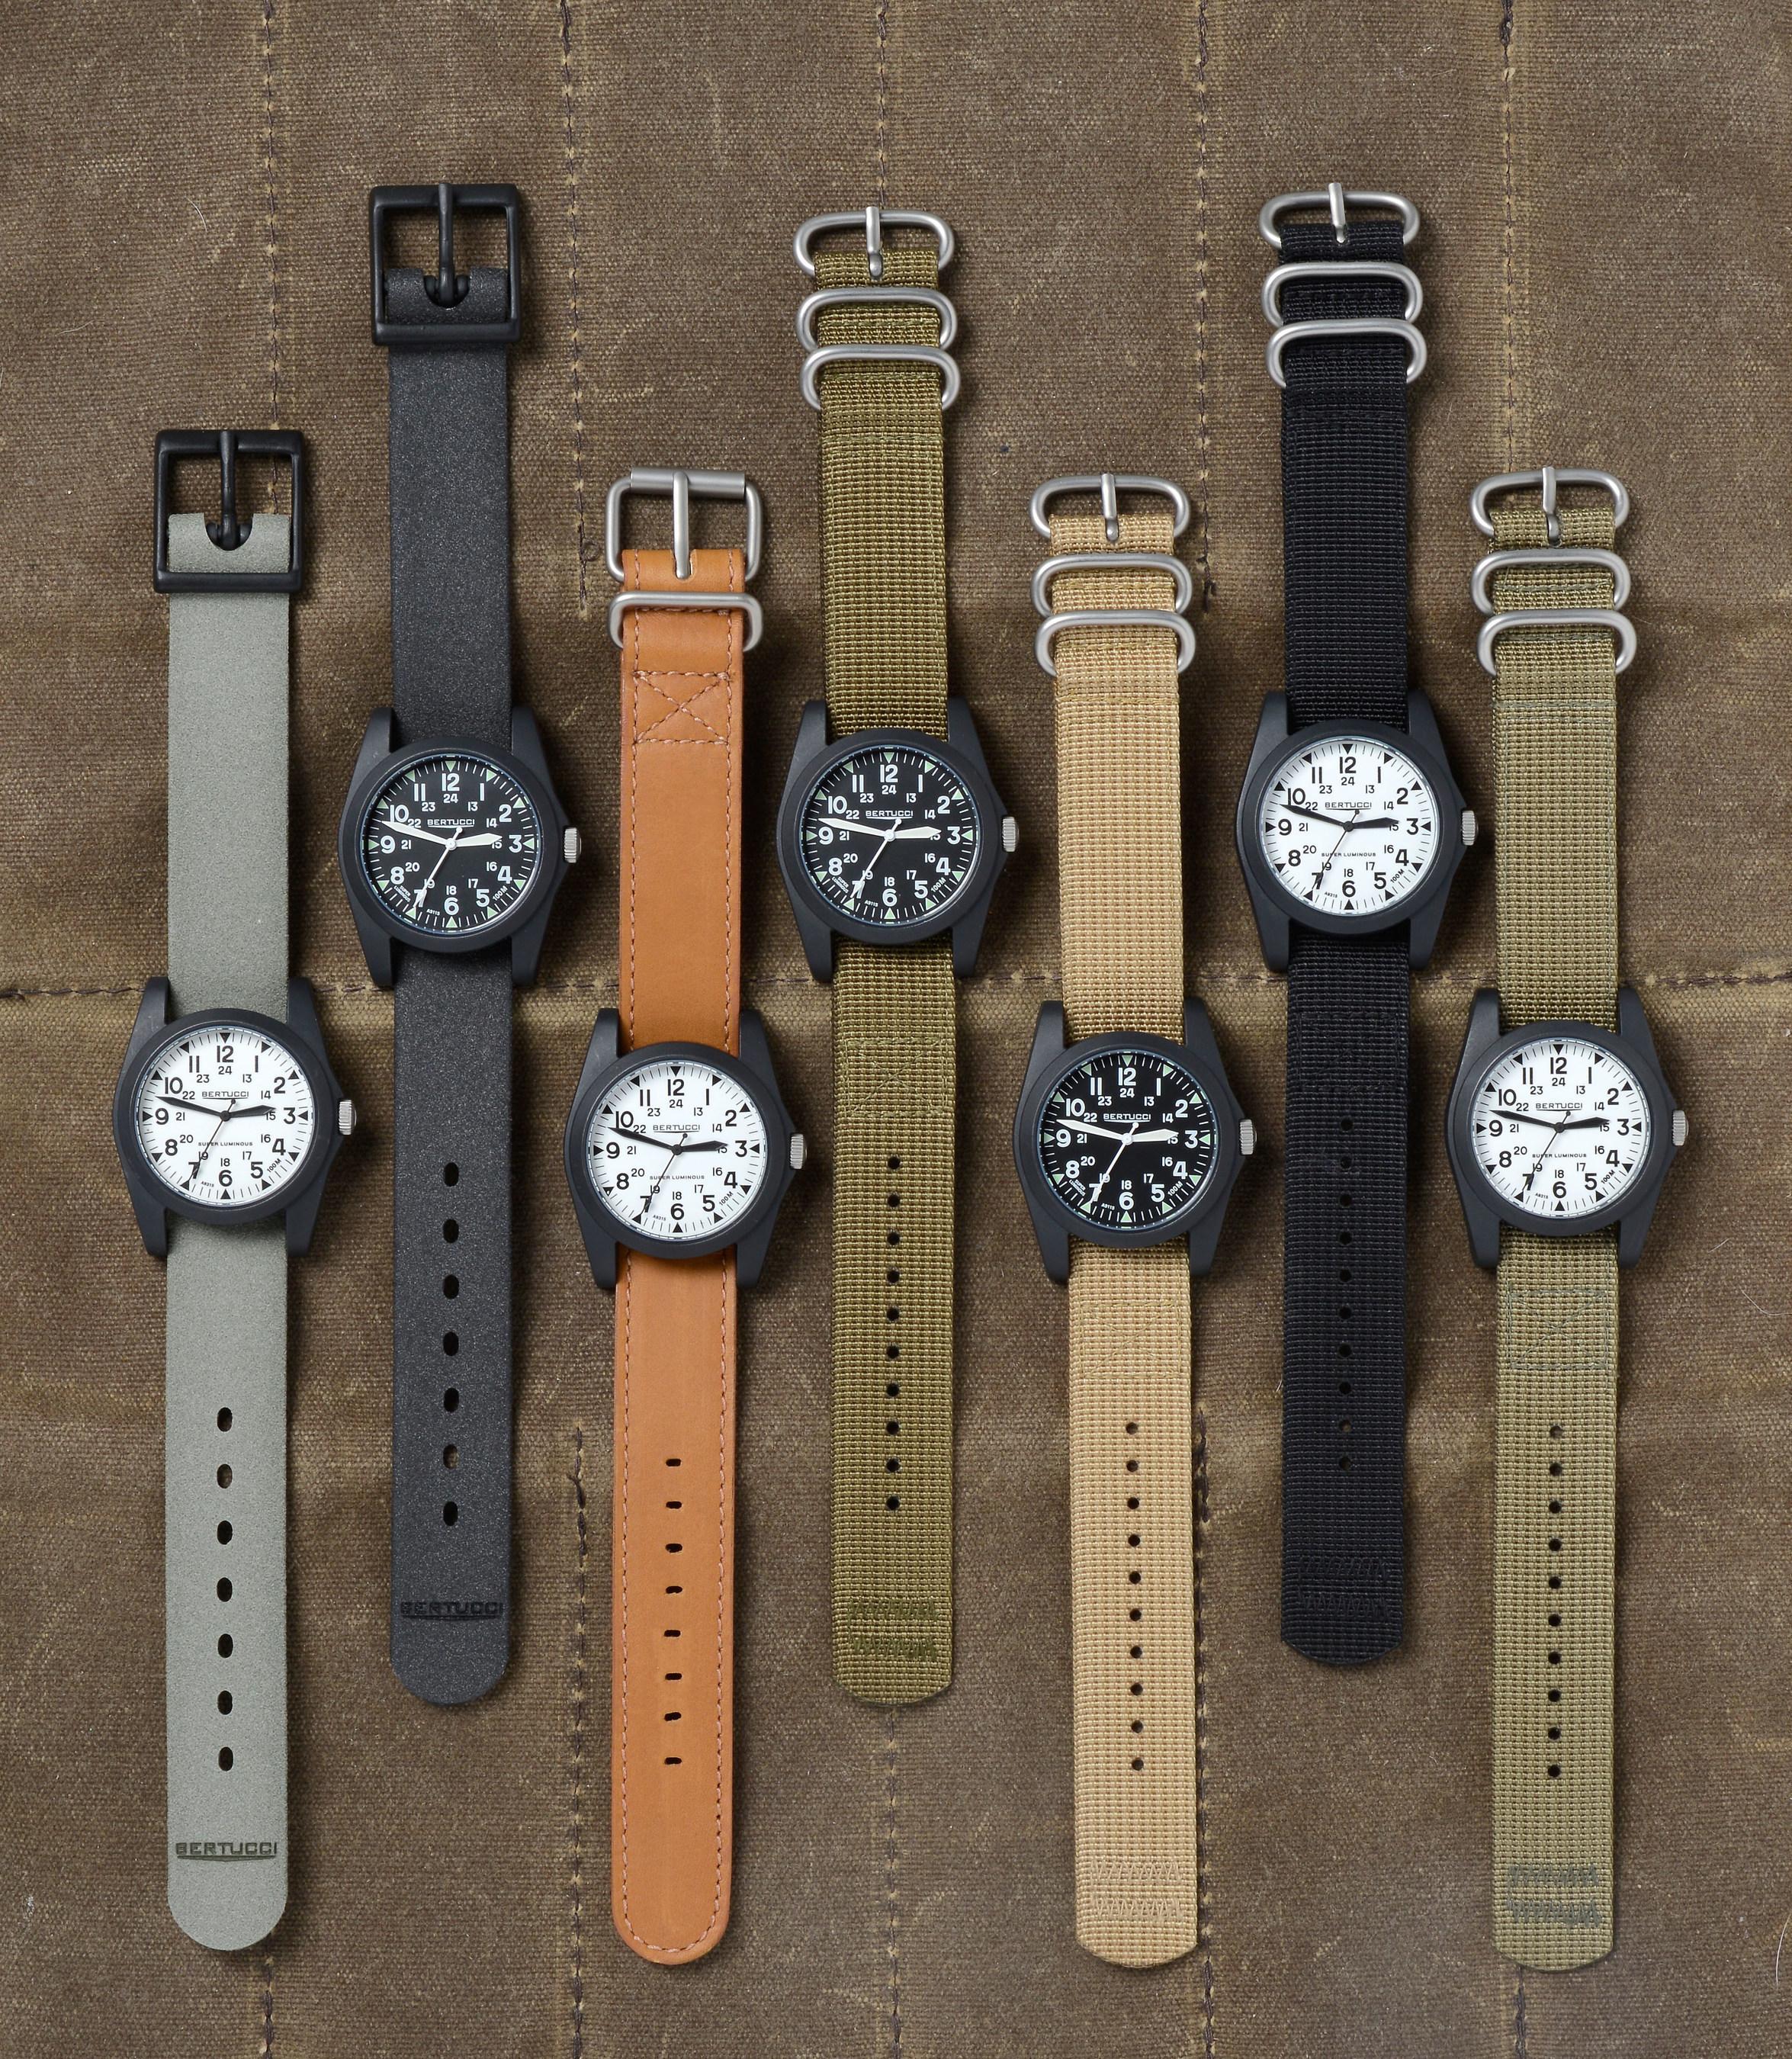 f174a85d4388 Bertucci(R) Performance Watches(TM) introduces the A-3P Sportsman Vintage